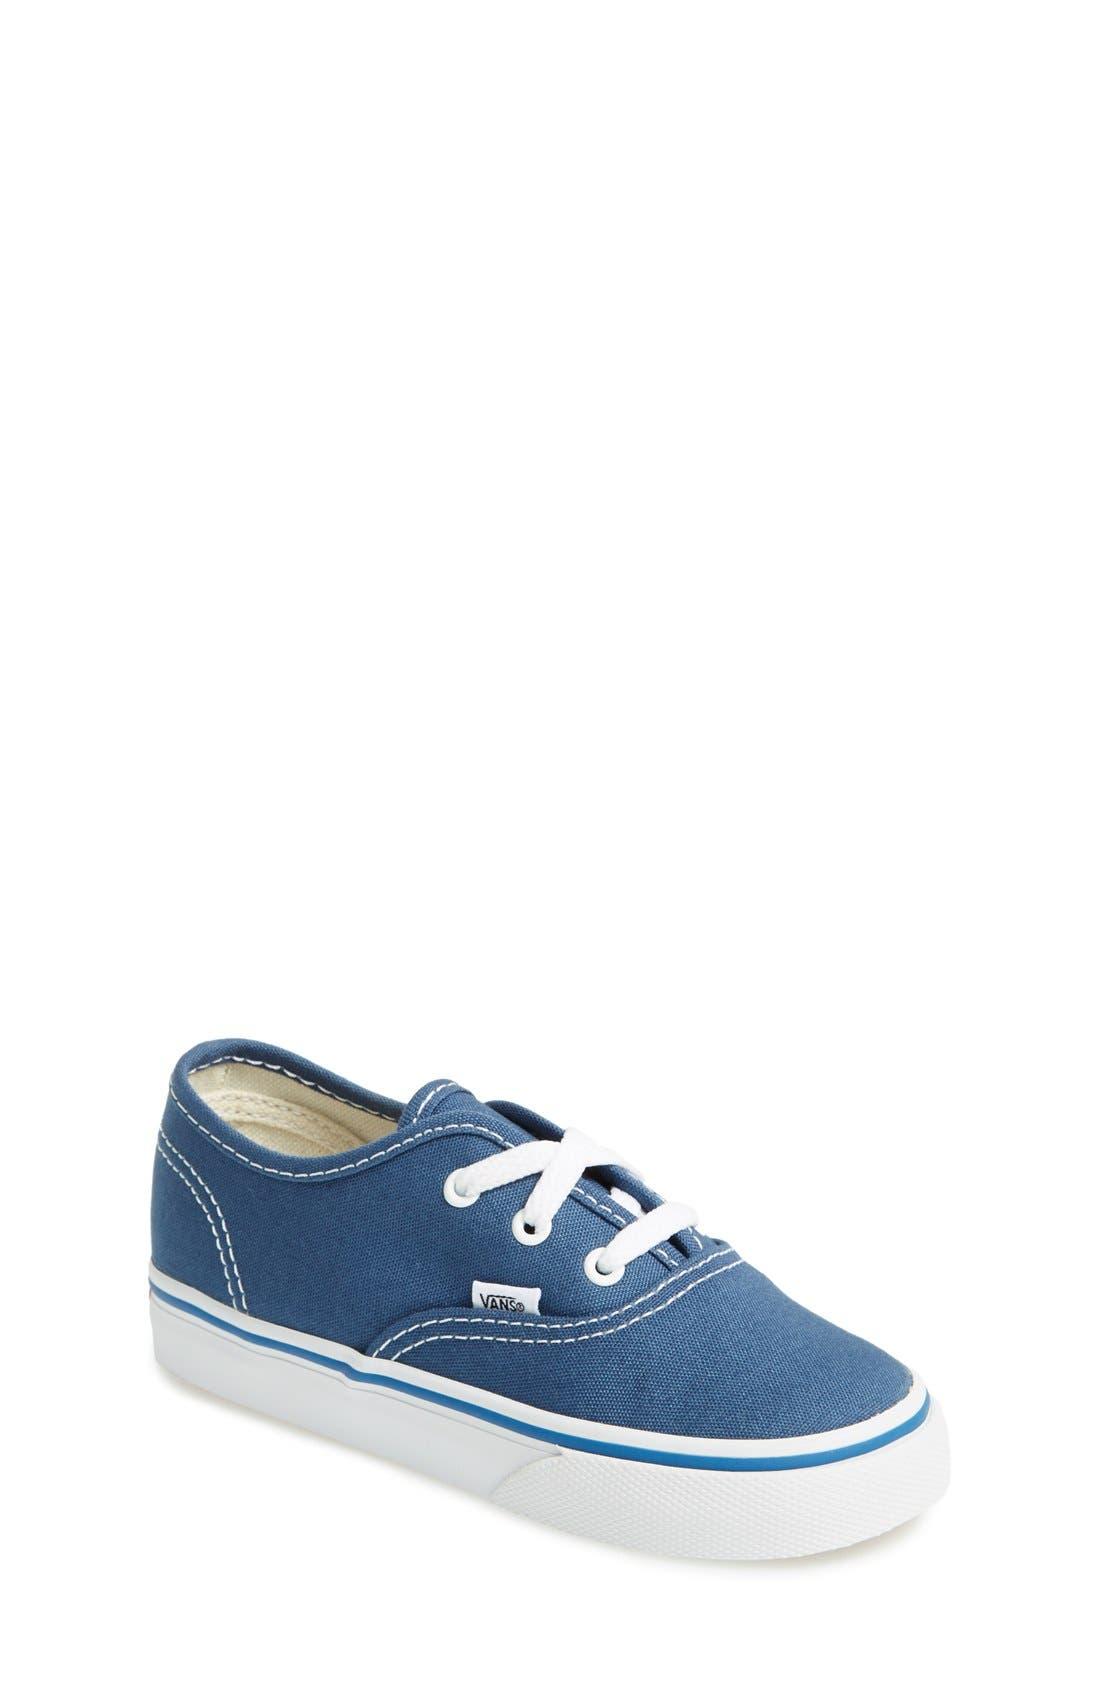 93fed45fa8 Girls vans shoes nordstrom jpg 1100x1687 Girls youth vans